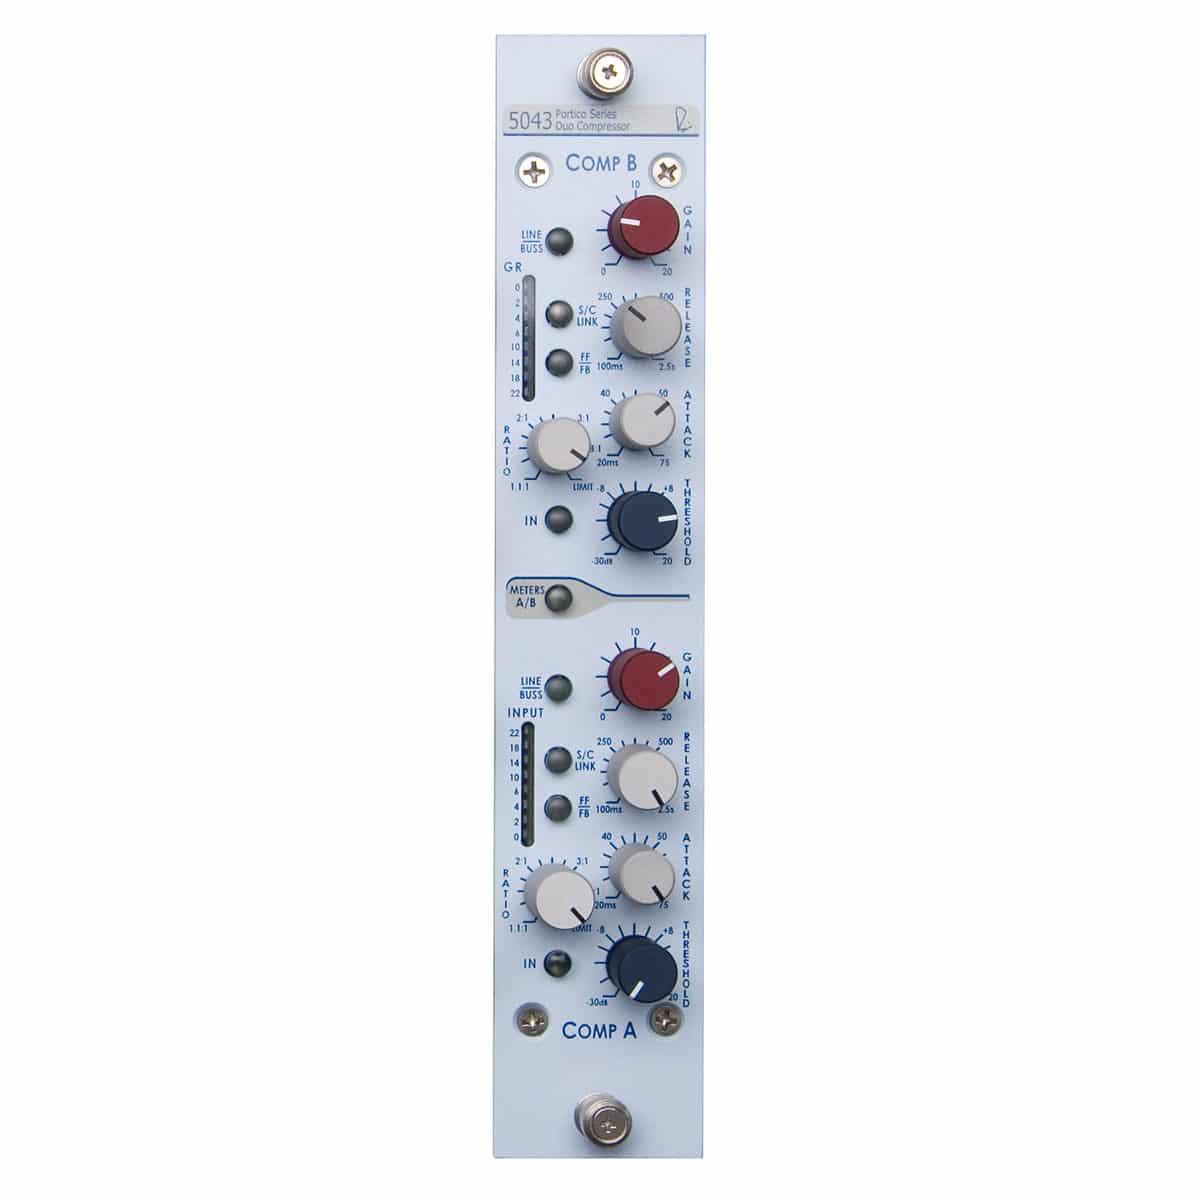 Rupert Neve 5043 V 01 Pro Audio, Outboard, Compressori